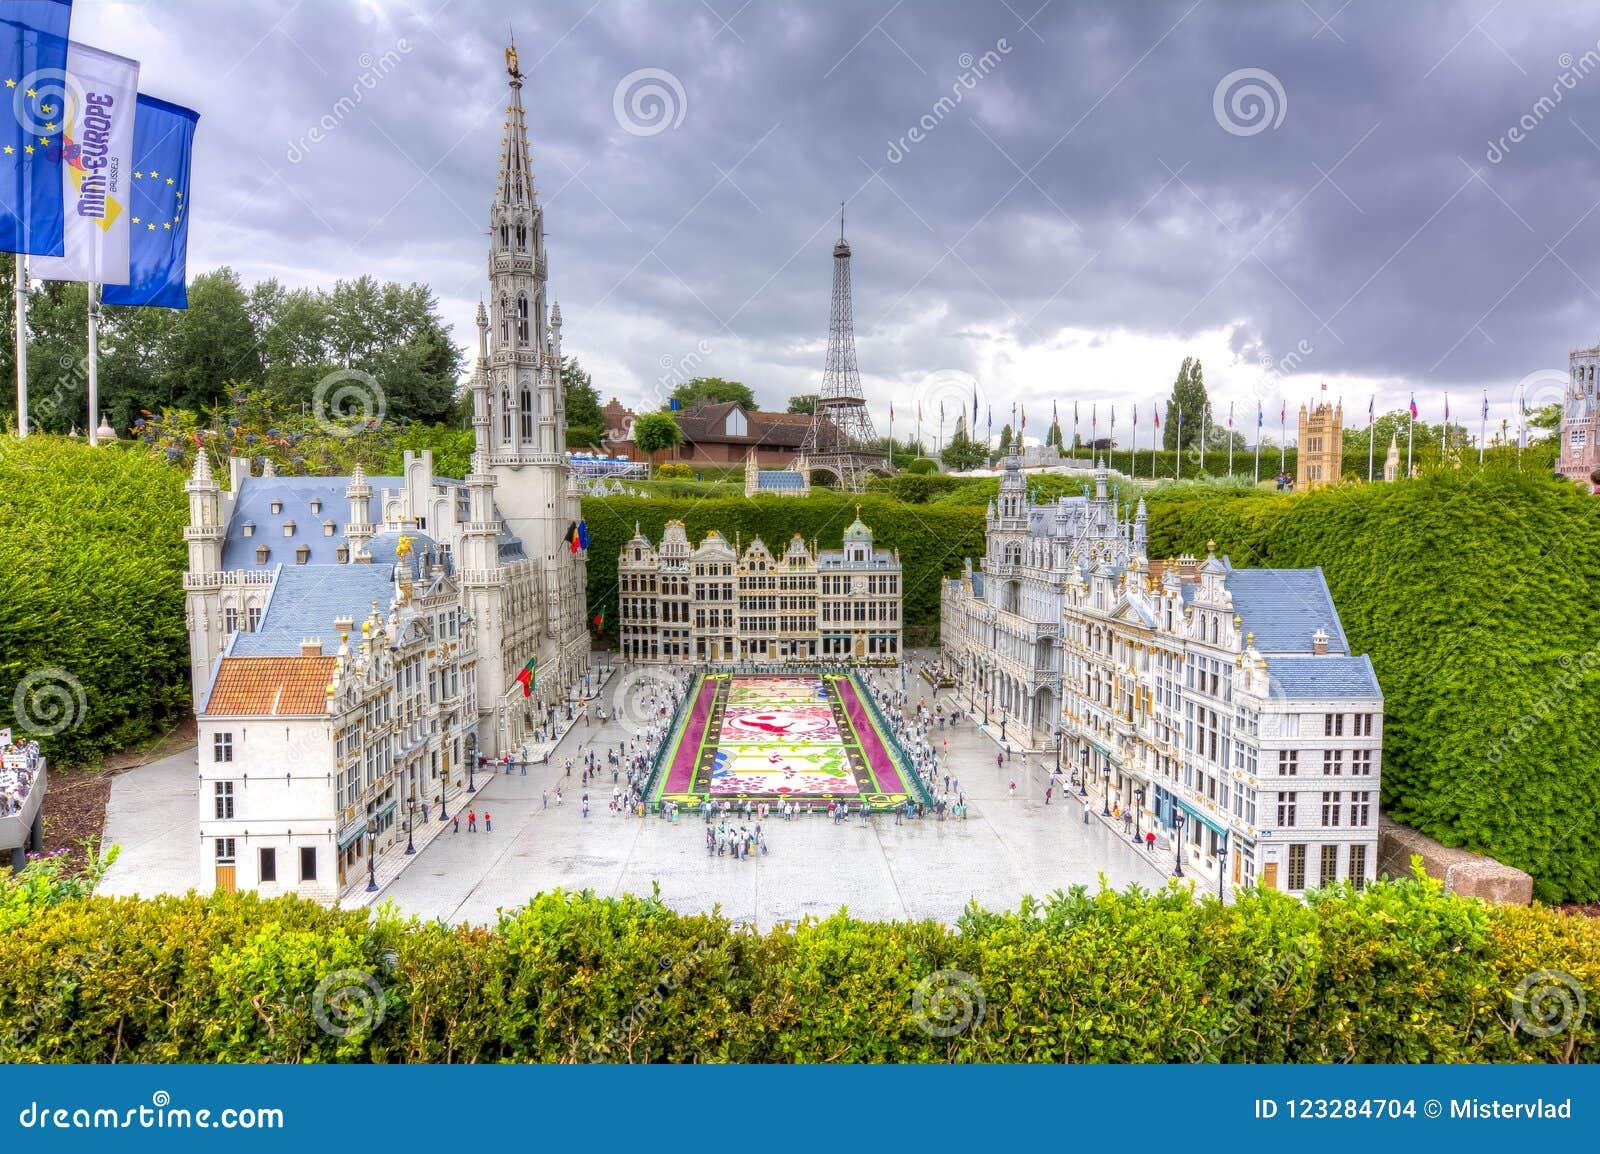 Brüssel Grand Place mit Blumenteppich in Mini-Europa-Park, Brüssel, Belgien